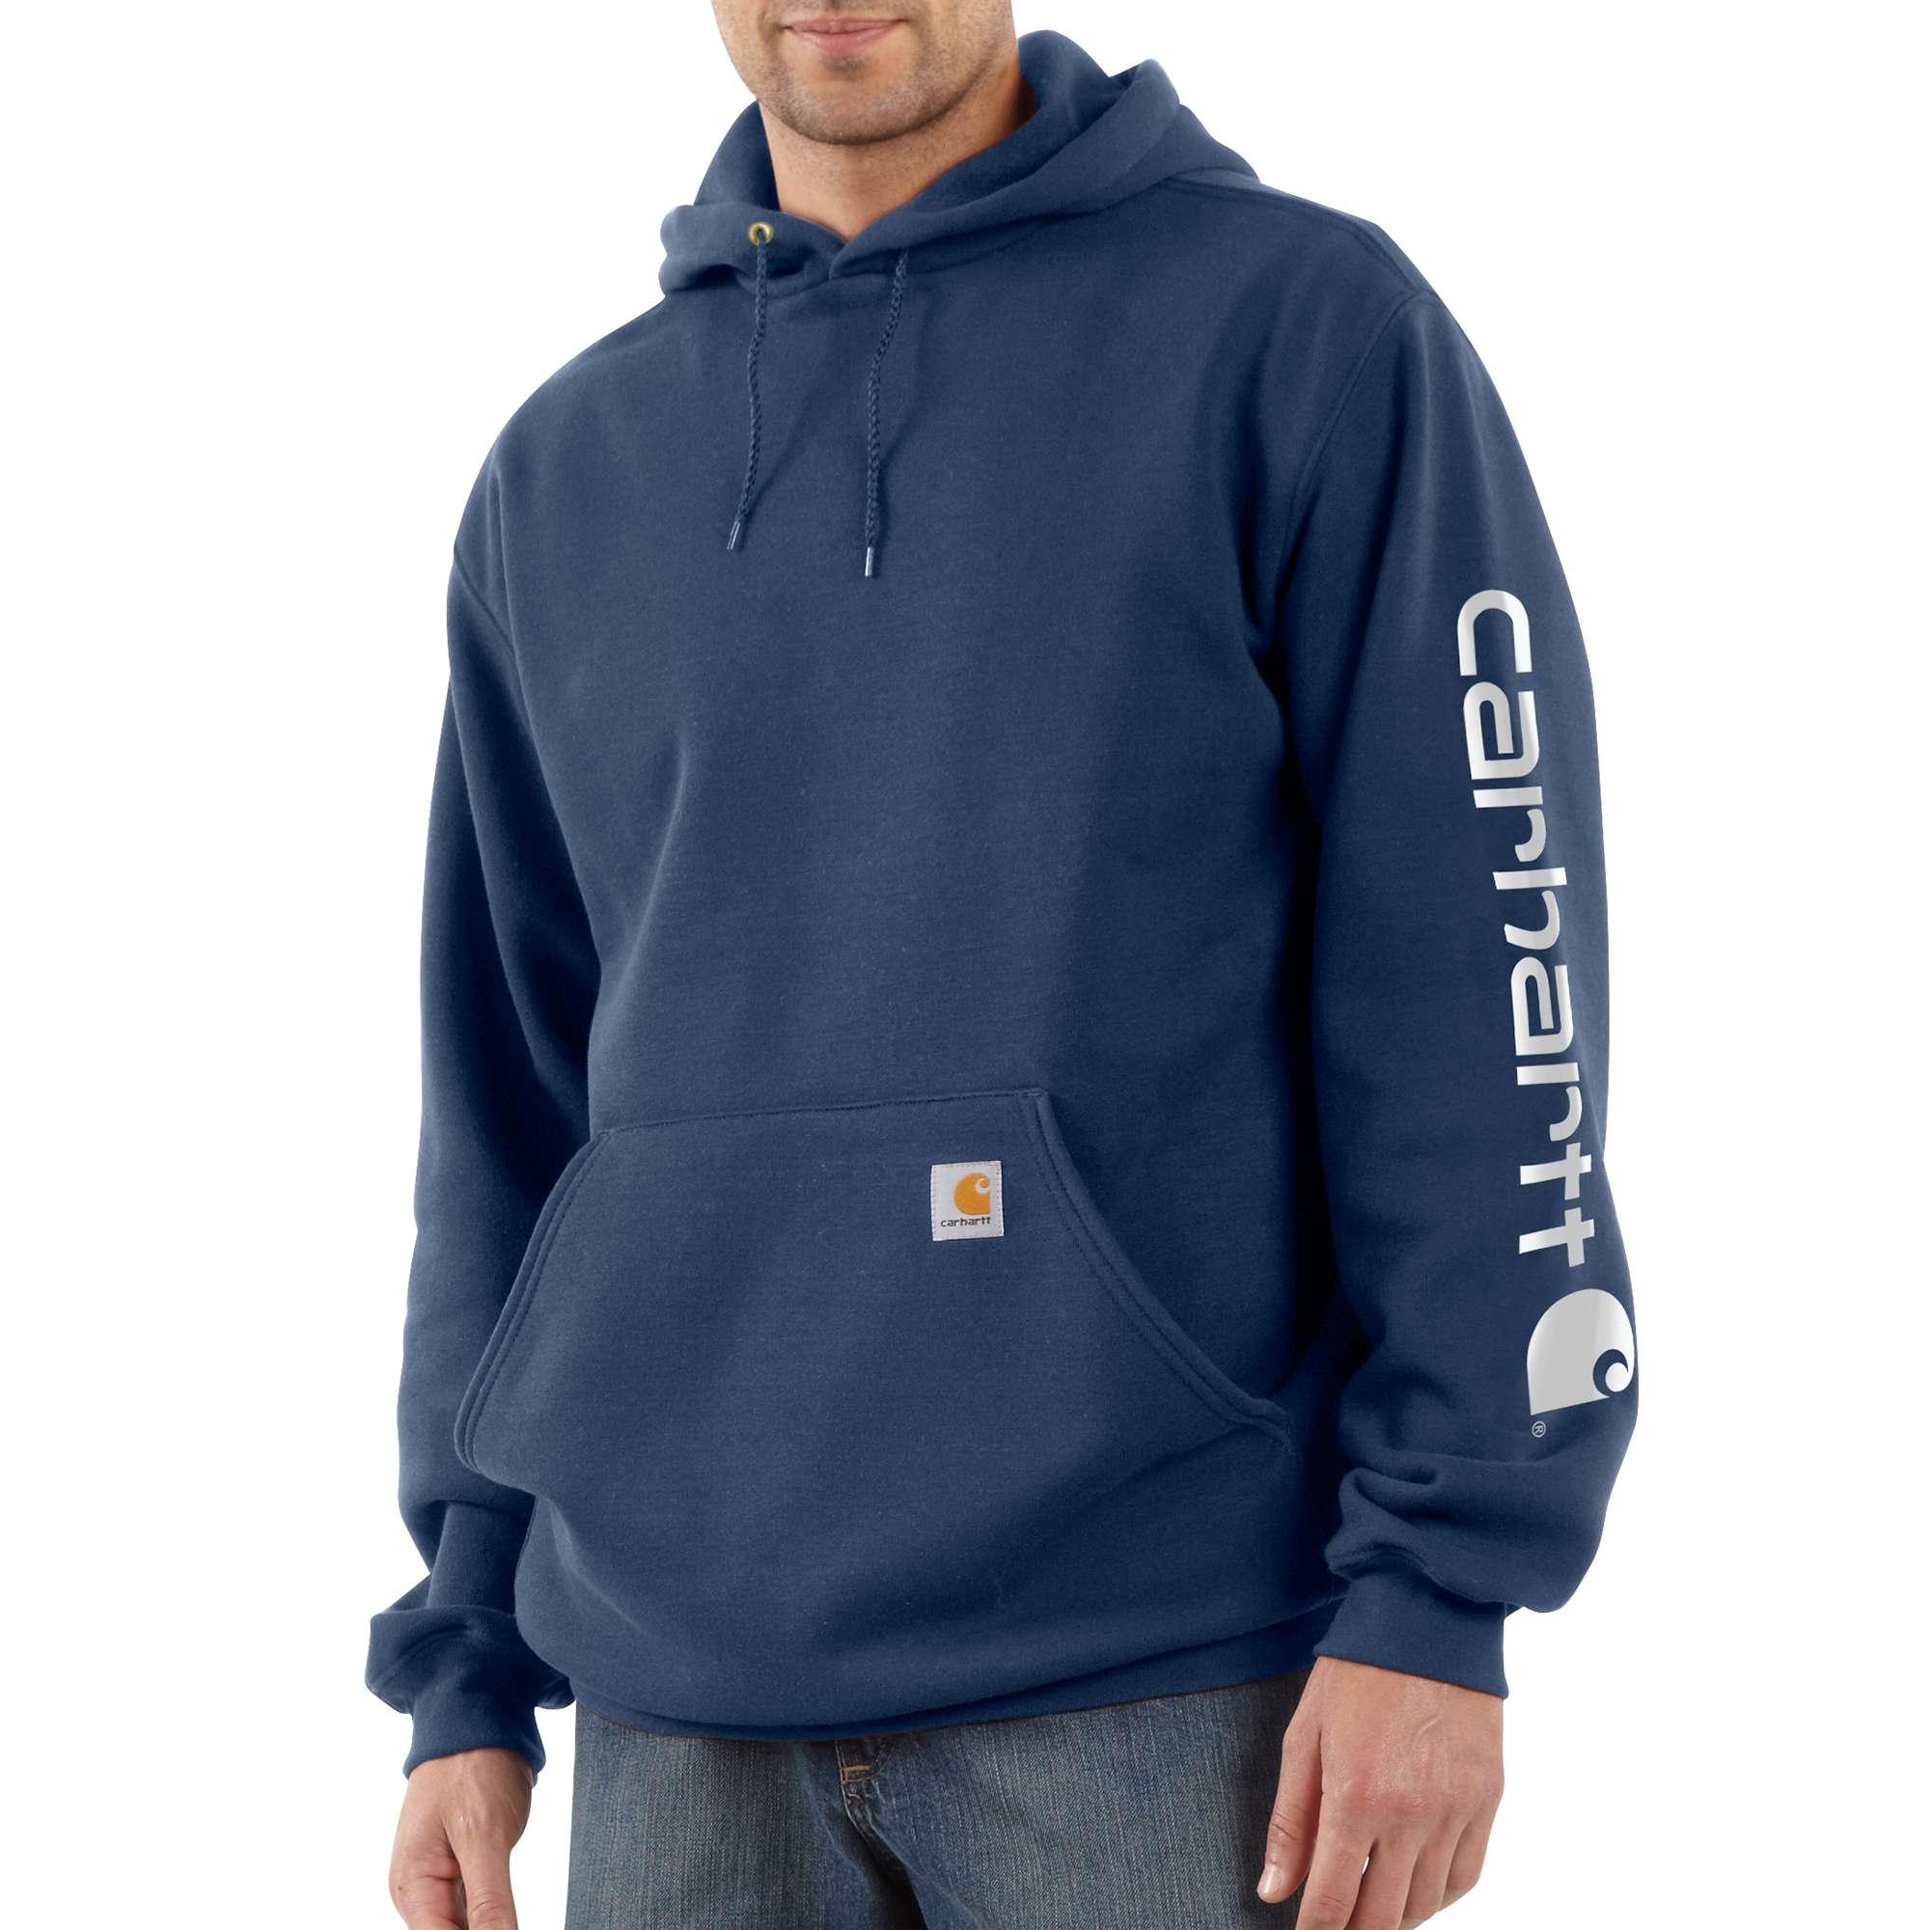 Men's Midweight Signature Logo Sleeve Hooded Sweatshirt, Navy, swatch